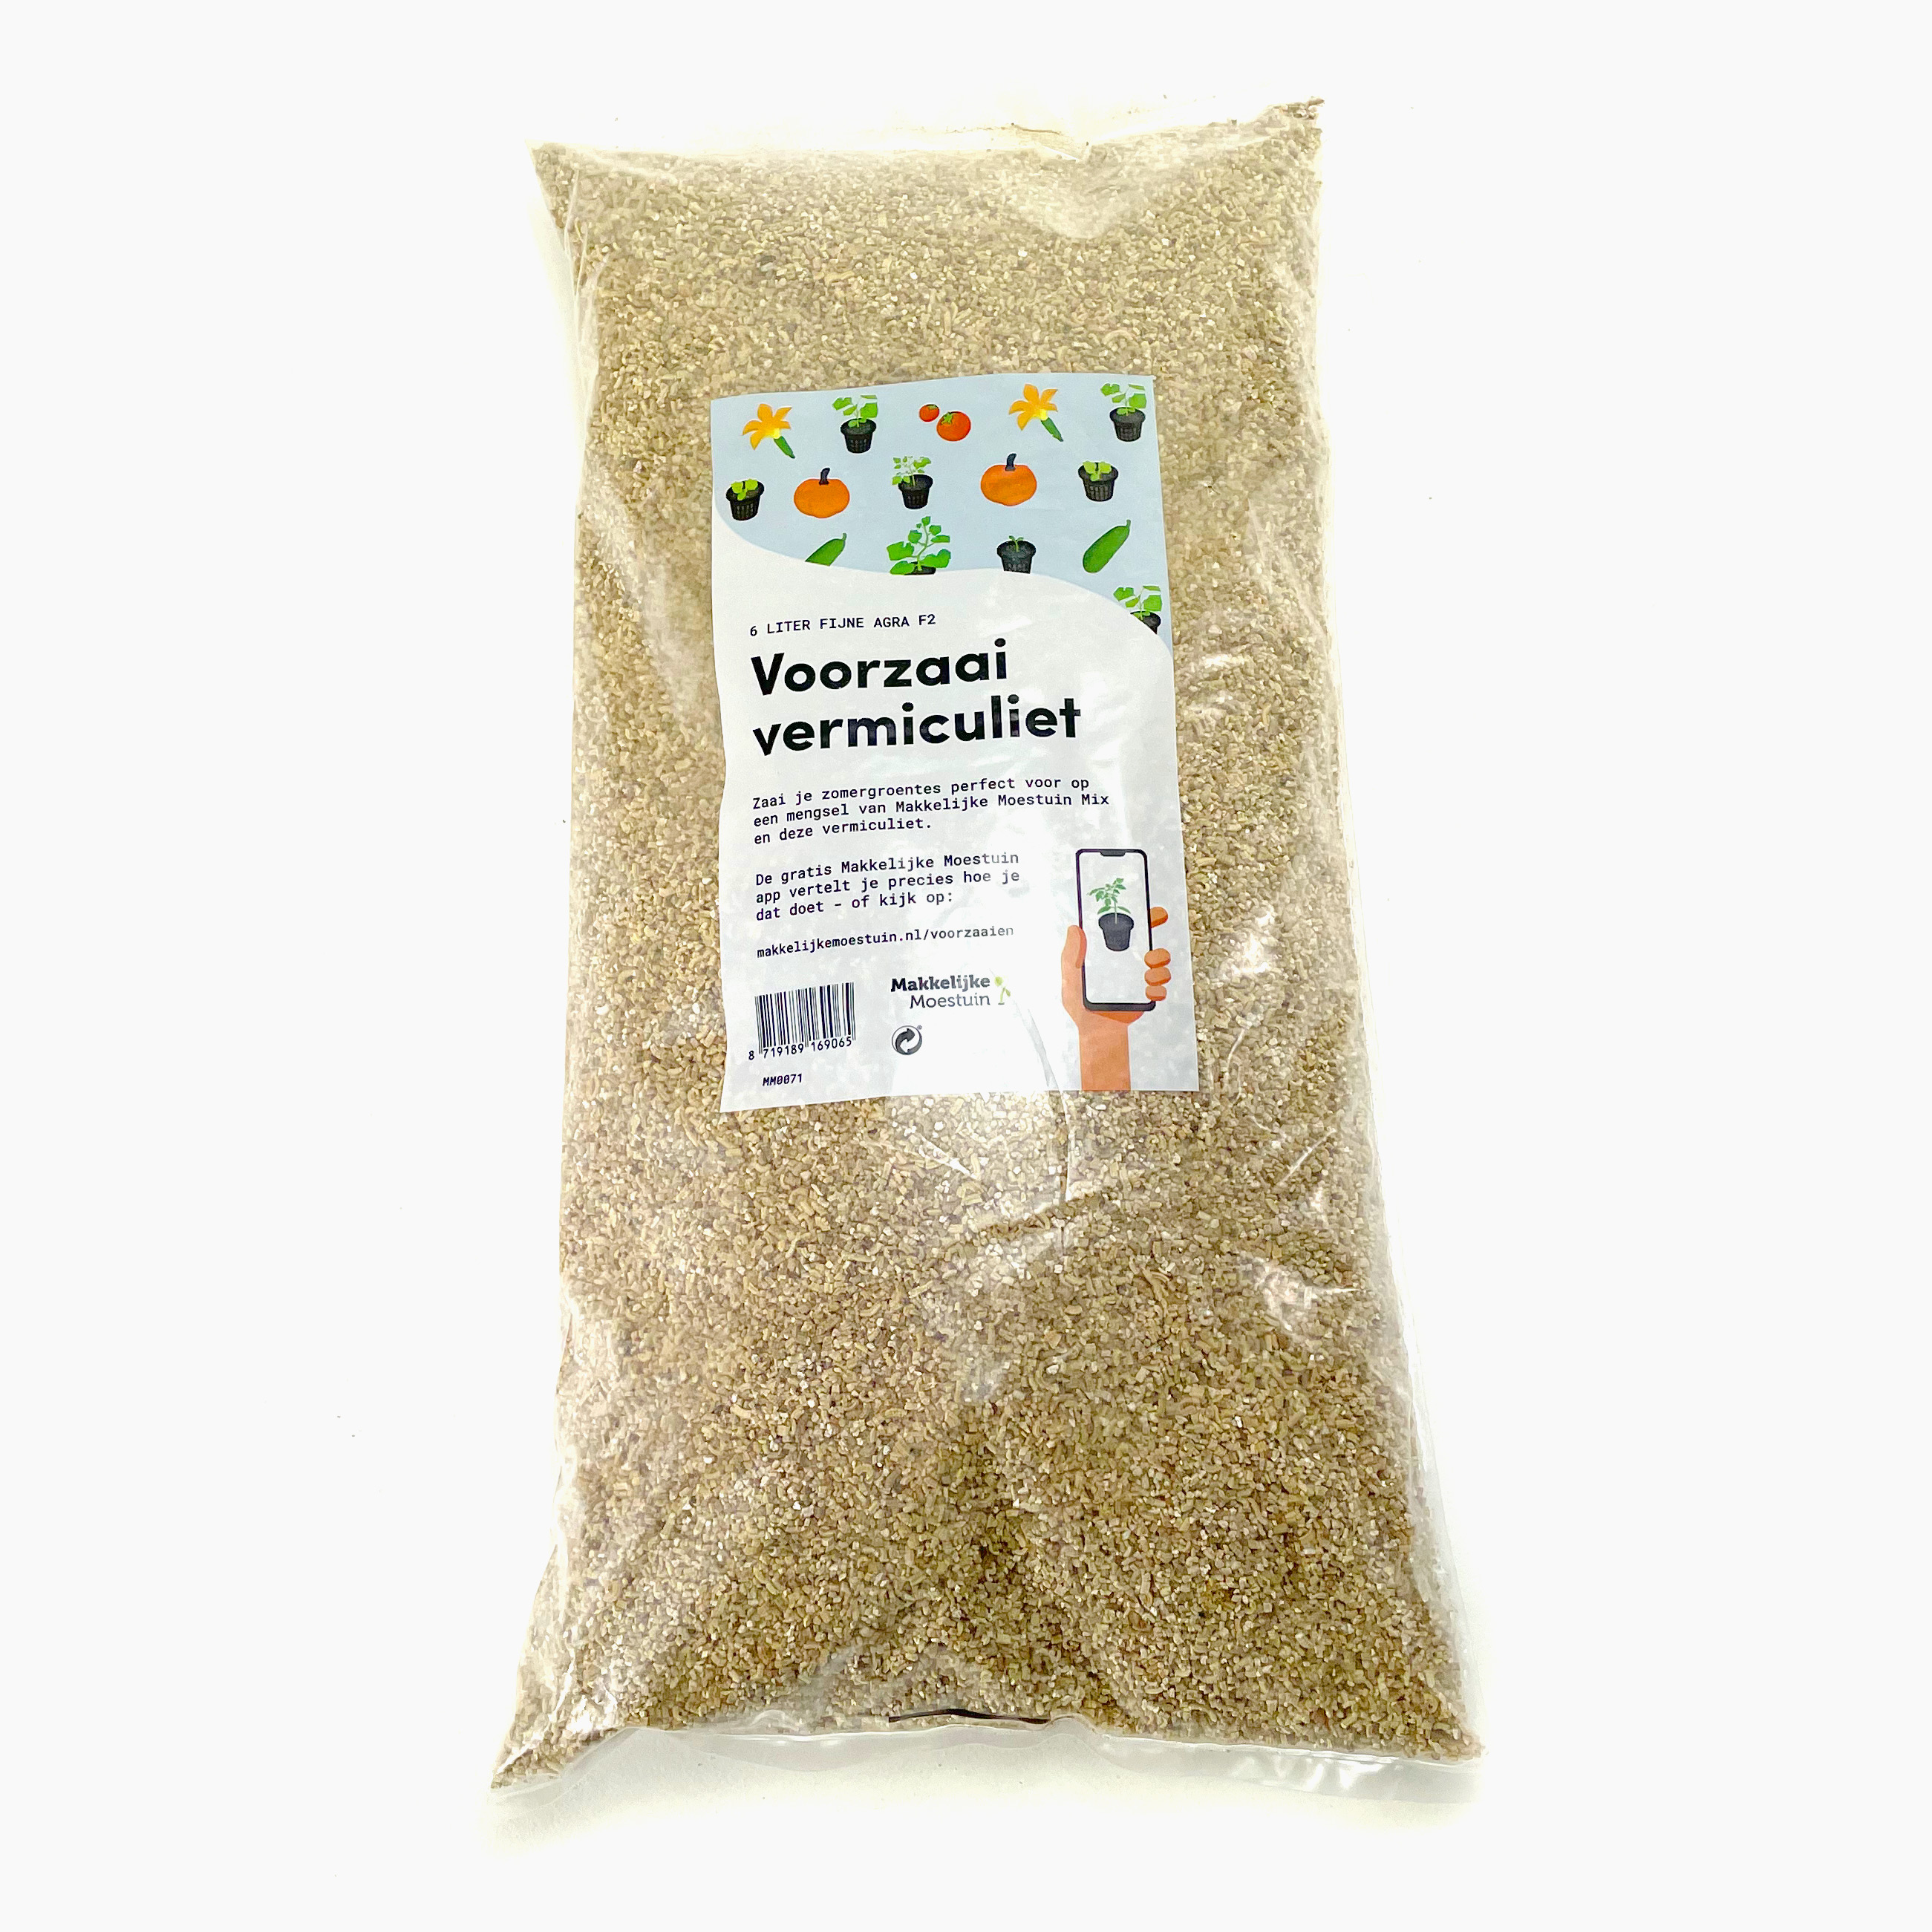 Vermiculiet1.jpg